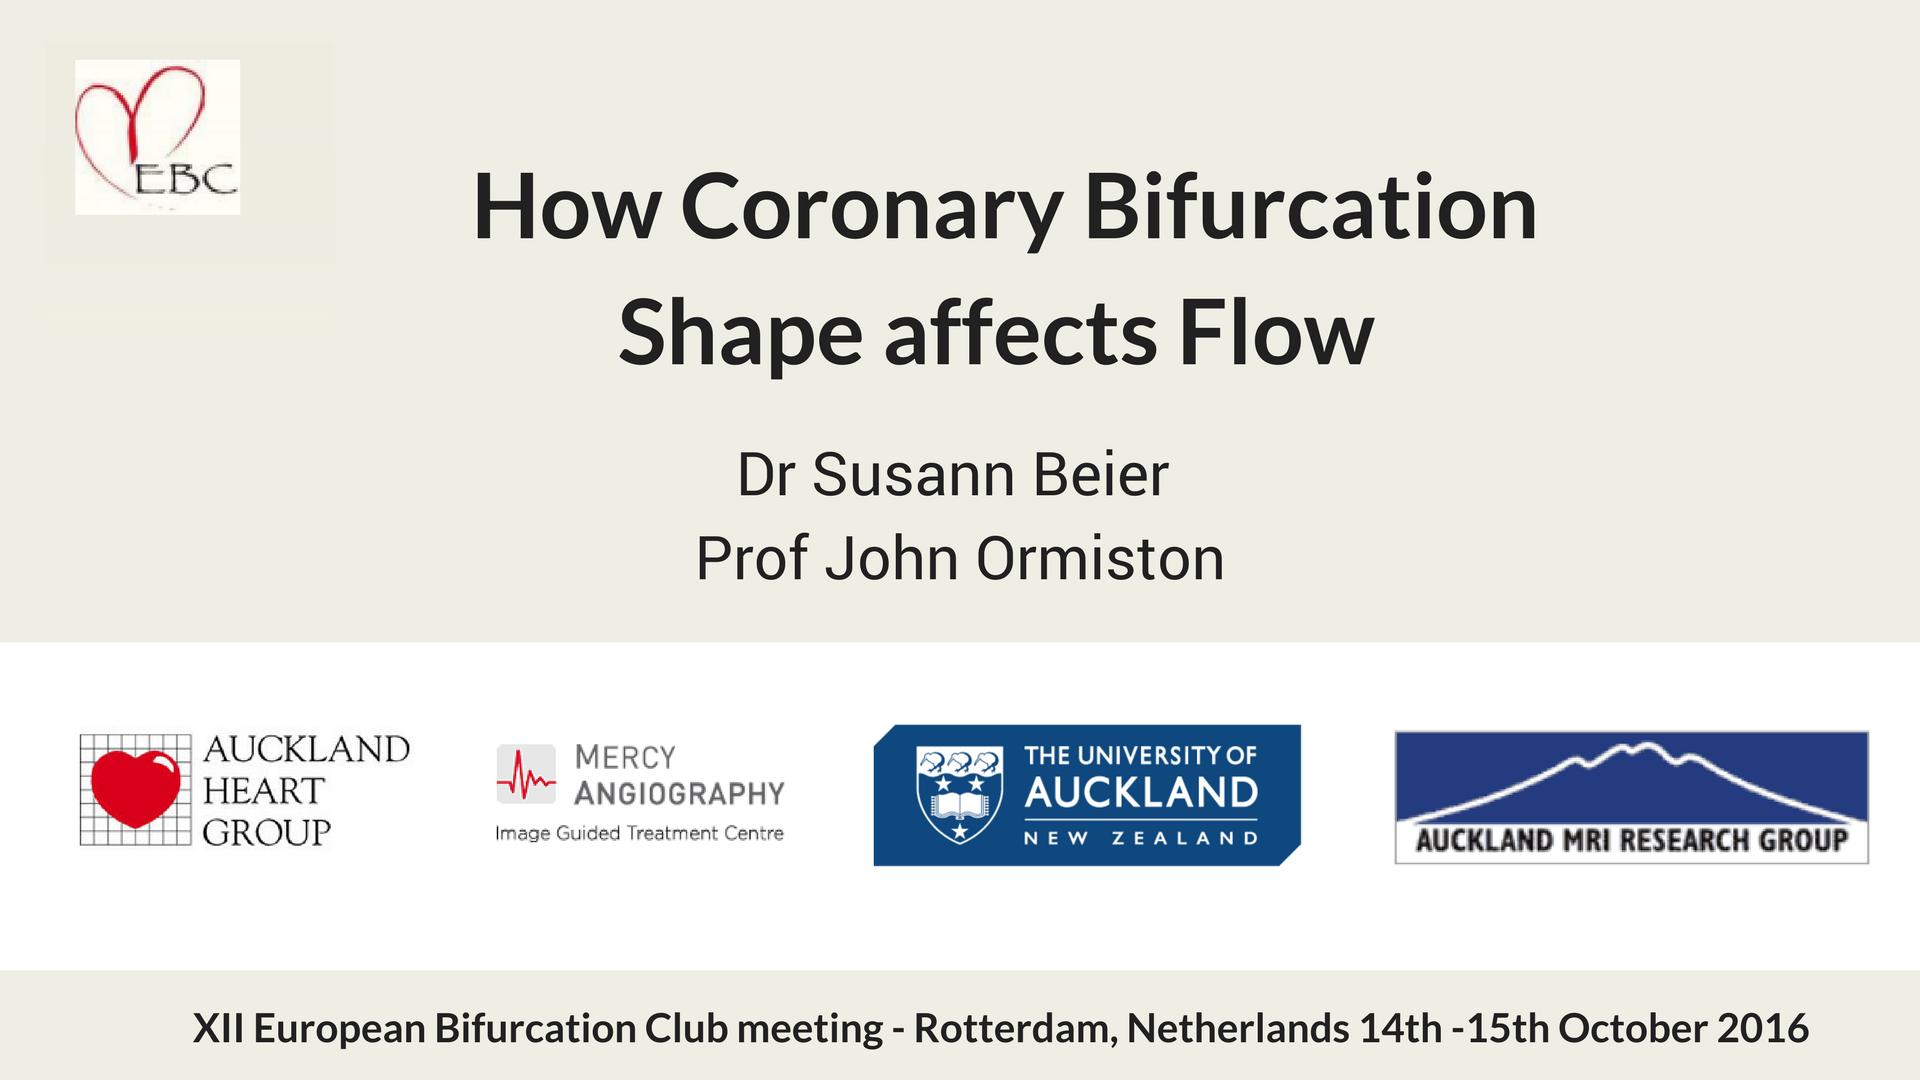 1 - How coronary bifurcation affects flow-195lpbp